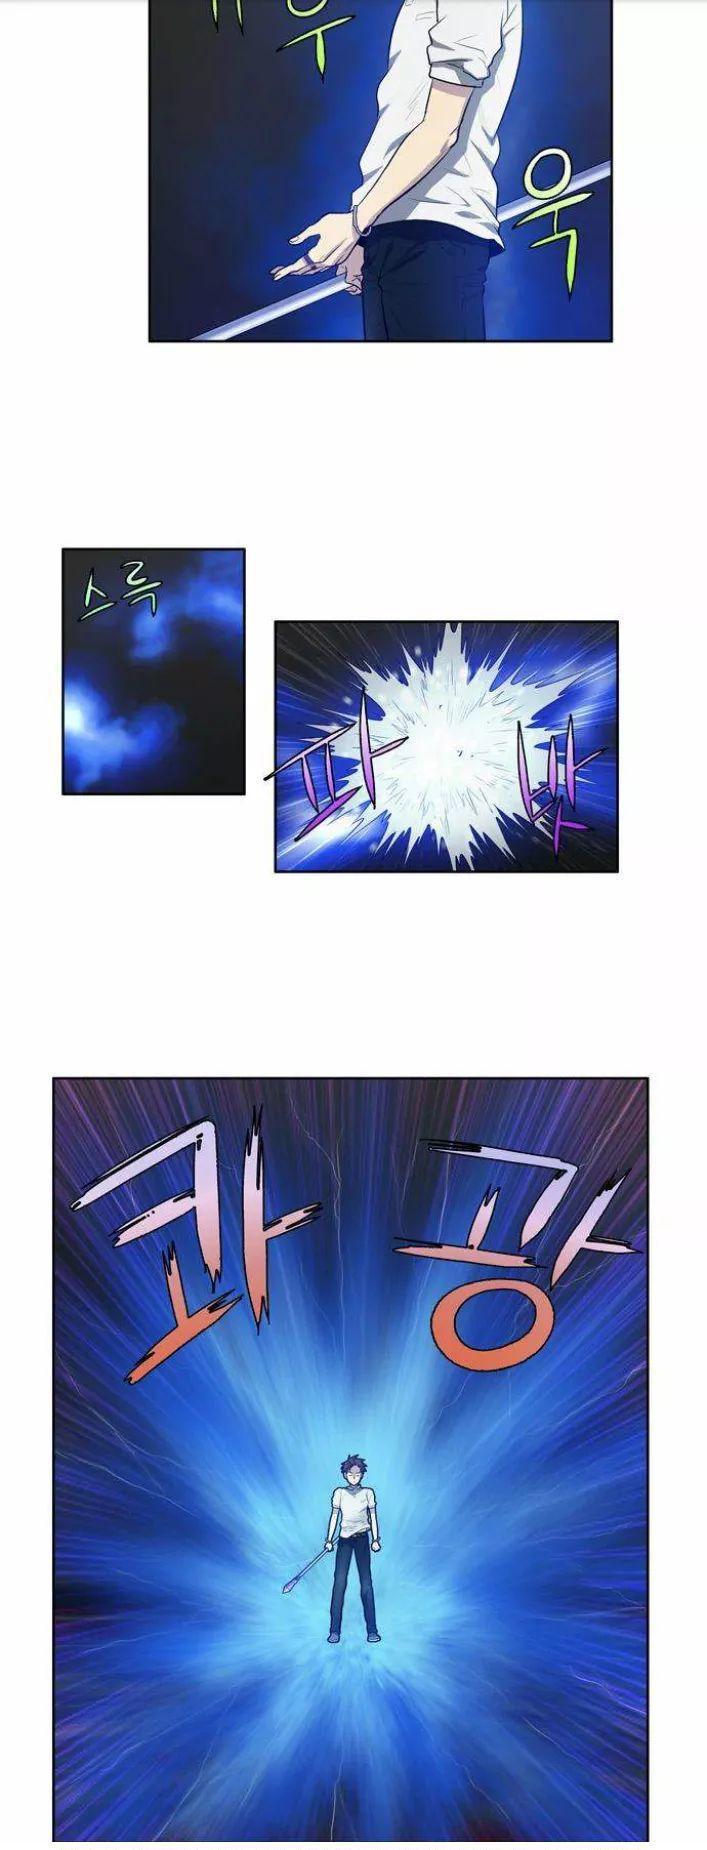 http://c5.ninemanga.com/es_manga/61/1725/484320/bee5d8d78549e85dee7d9e81885d19b5.jpg Page 3